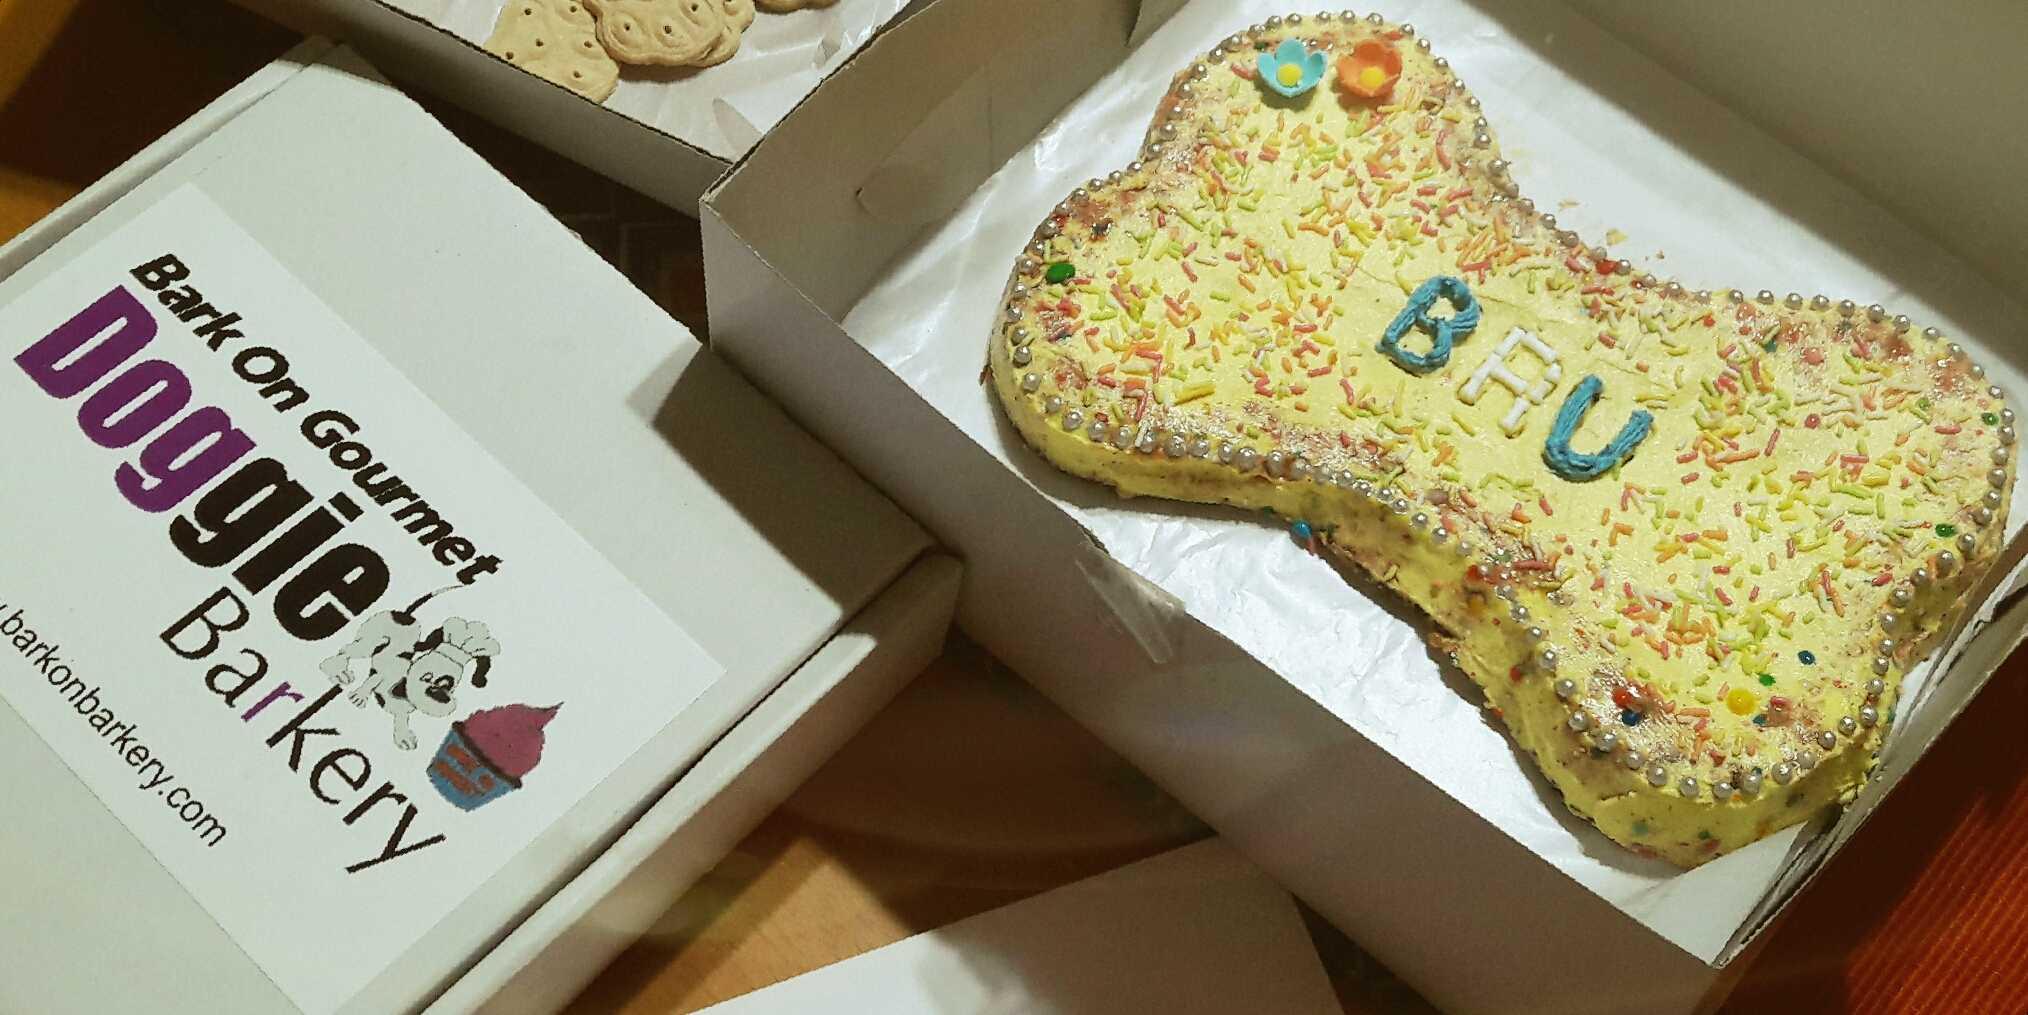 Gourmet dog cakes by bark On Bakery-fnbworld-ridhi chhabra